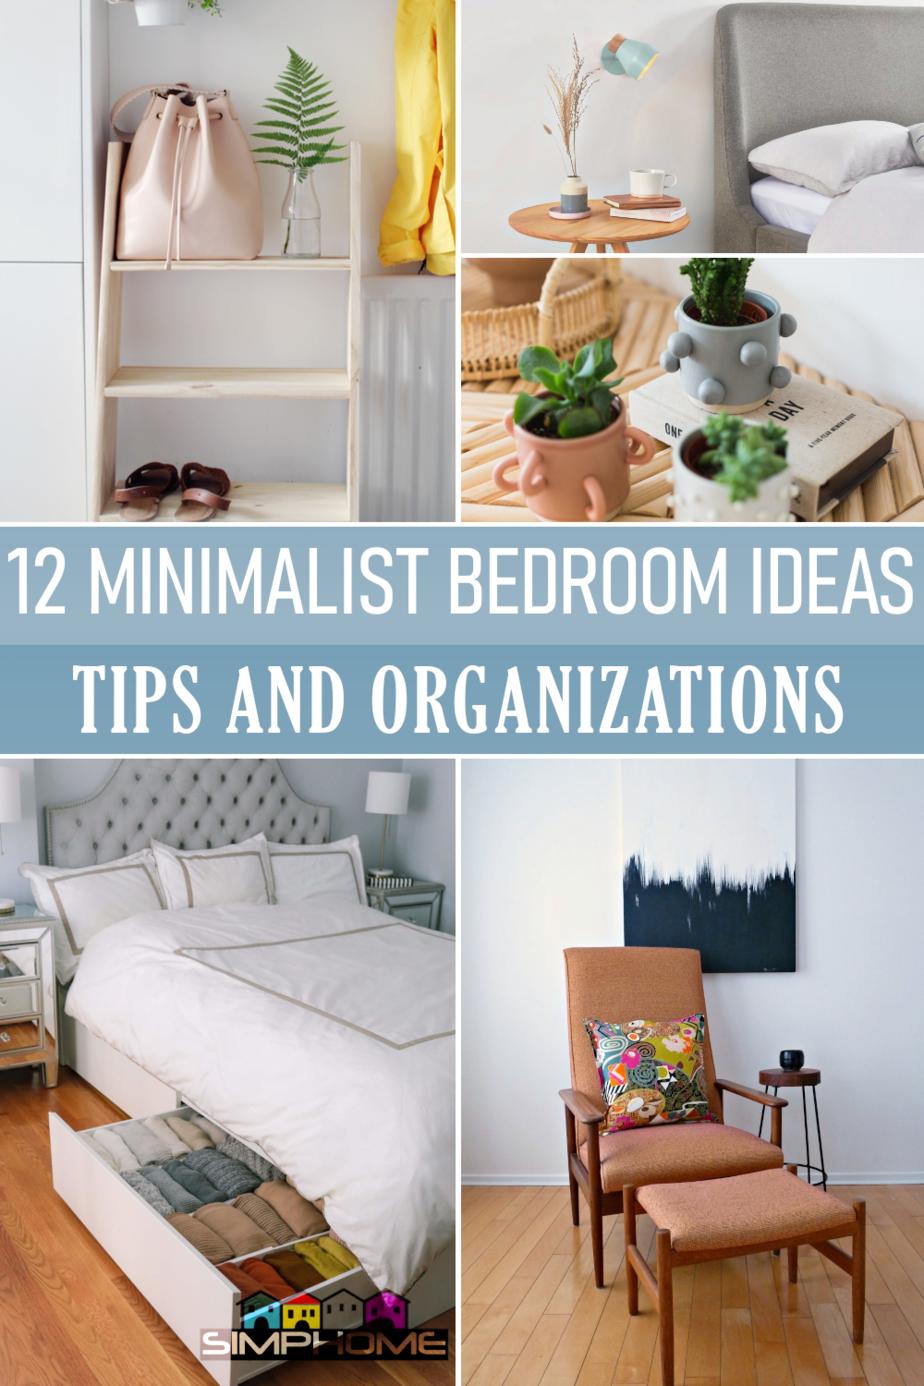 12 Minimalist Bedroom Organization Tips via Simphome.comFeatured Image